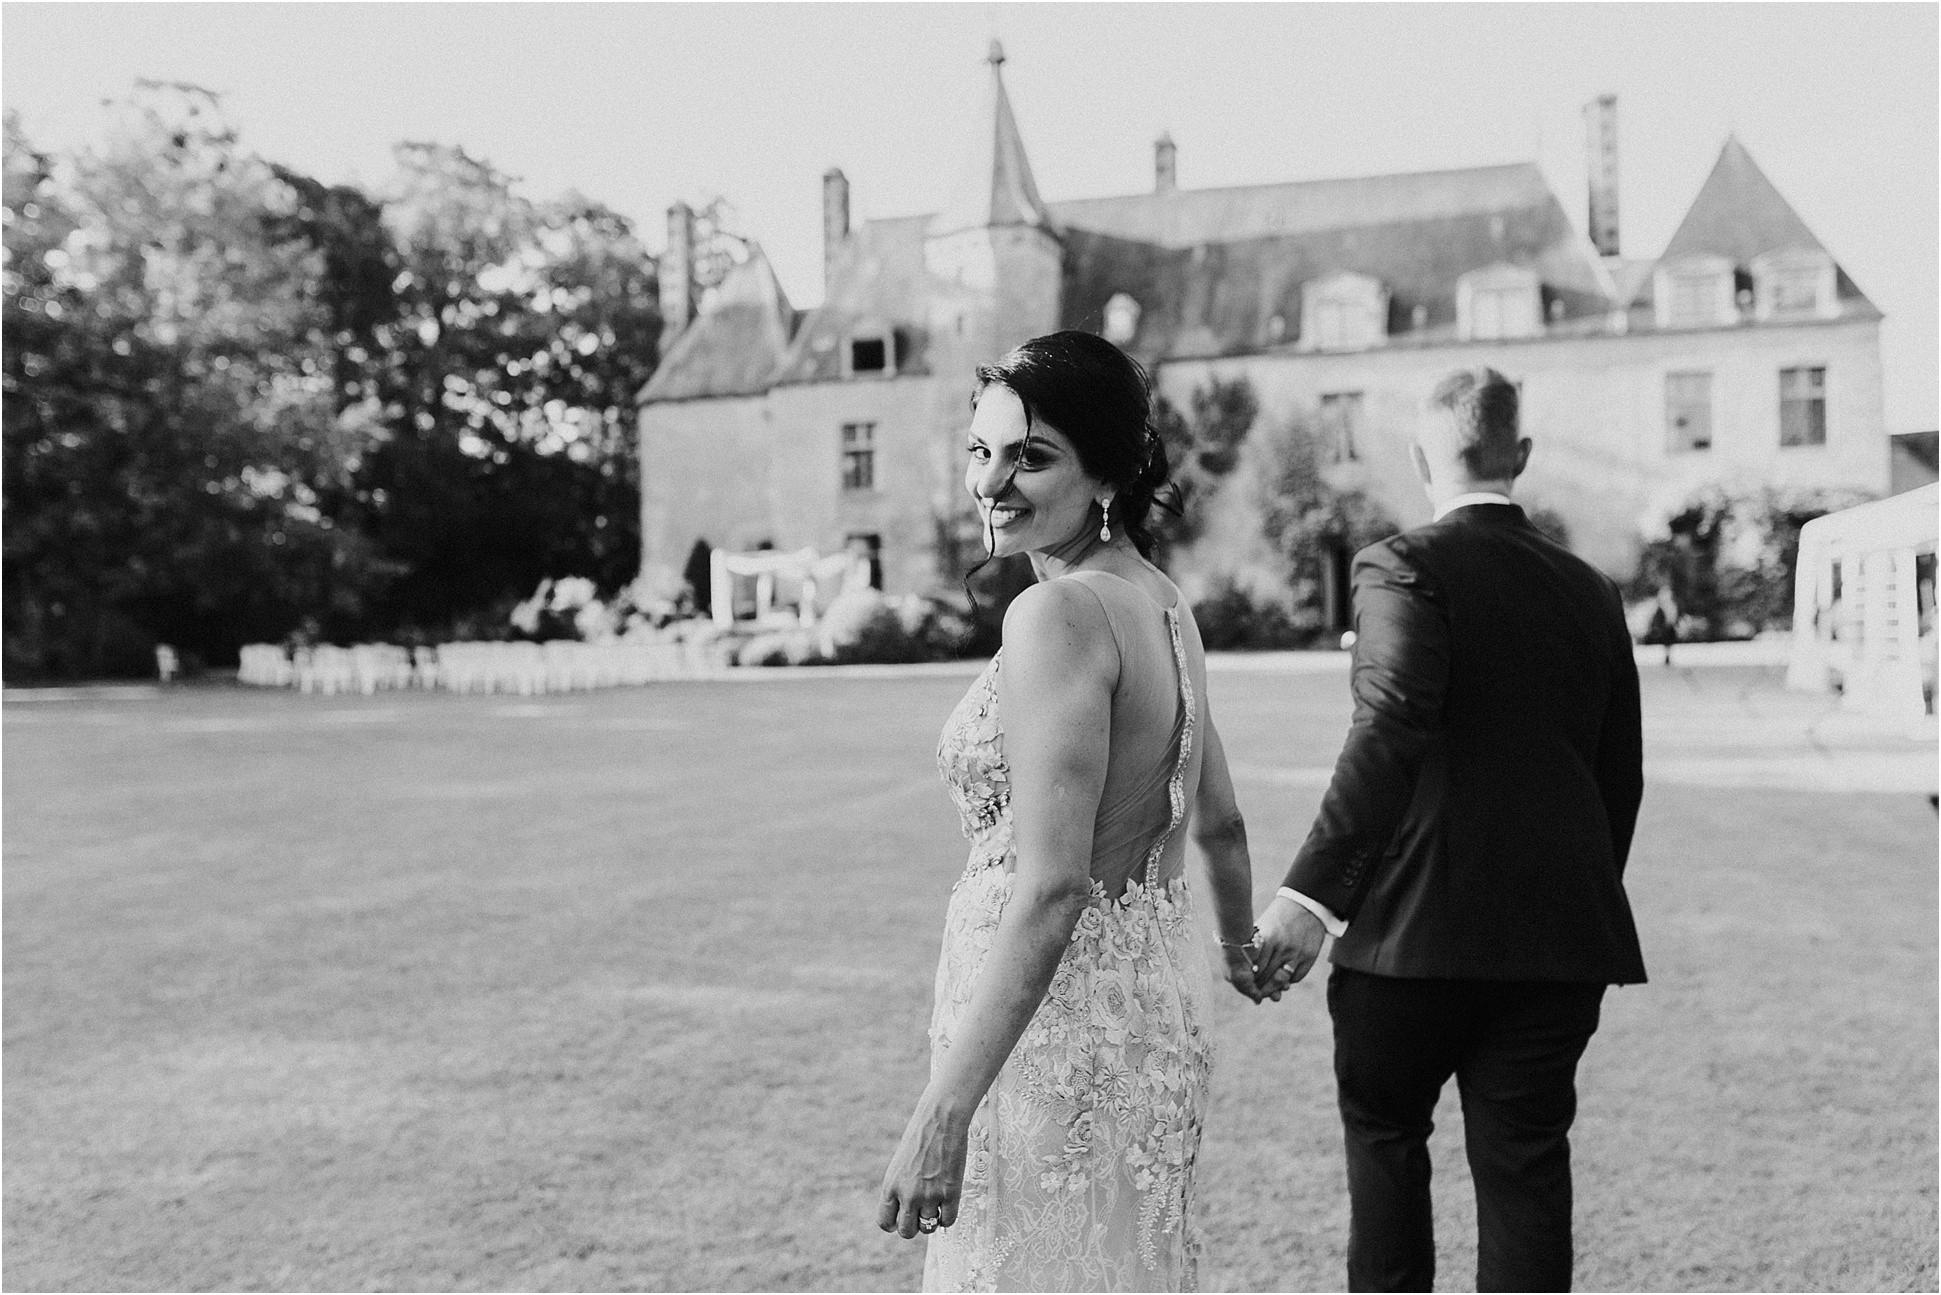 Kateryna-photos-photographe-mariage-chateau-st-paterne-mayenne-normandie_0179.jpg